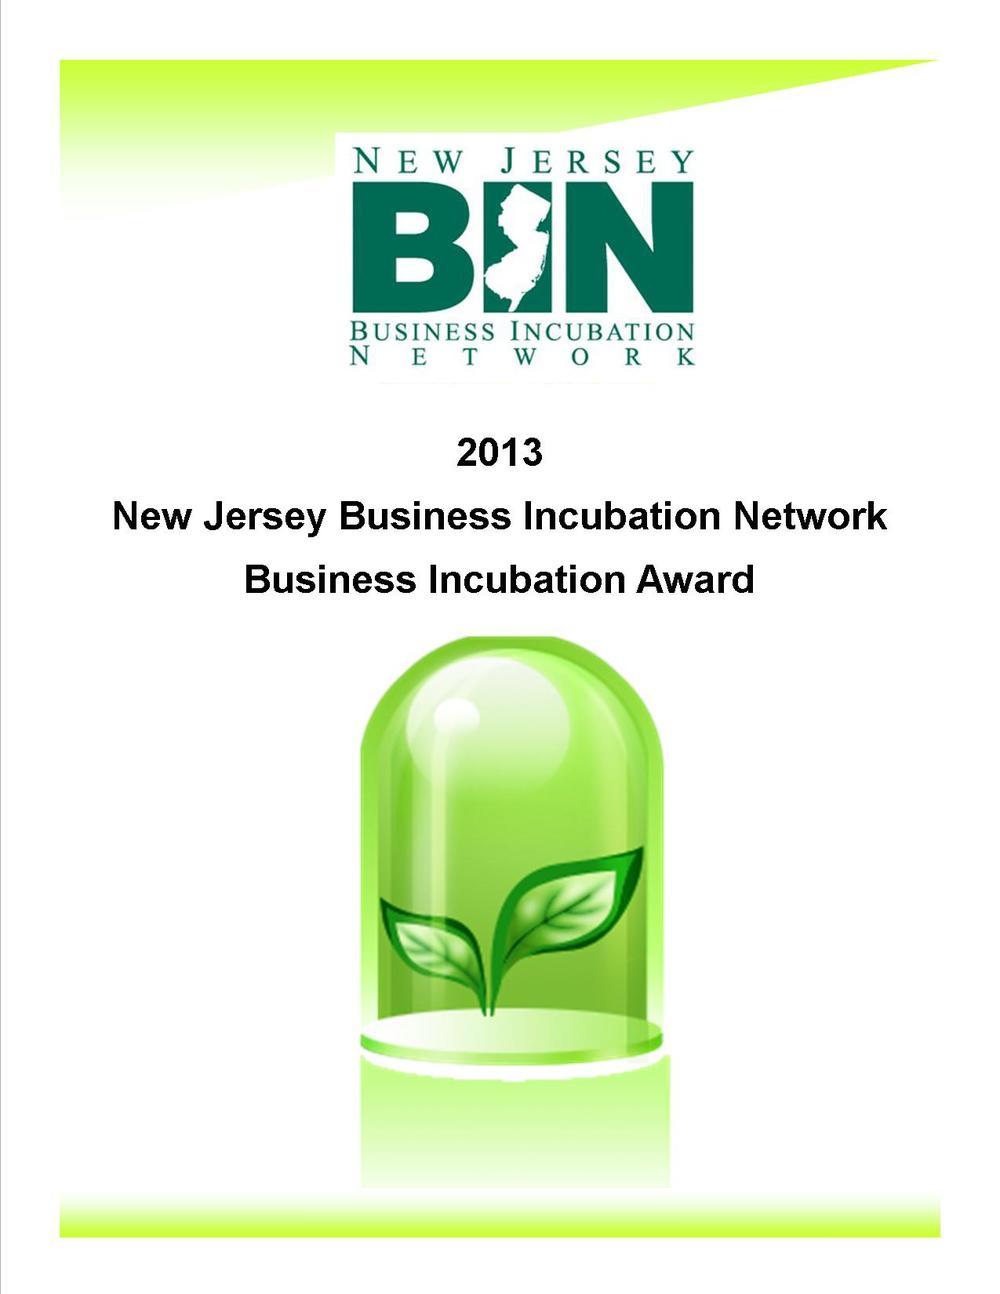 03.14.13 NJBIN Awards Logo.jpg